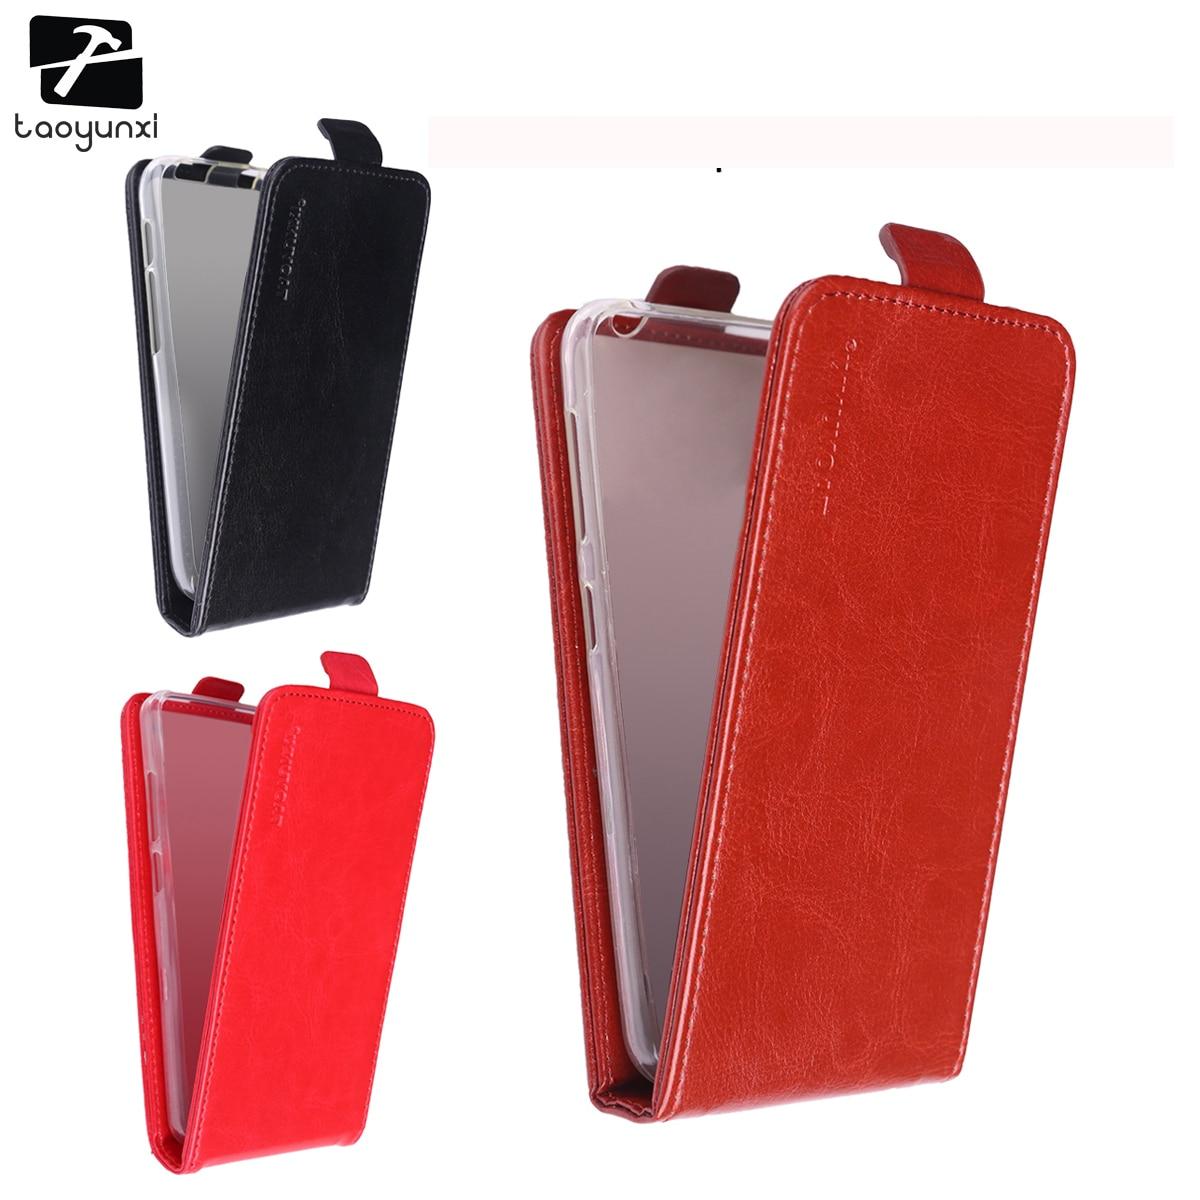 TAOYUNXI Flip Phone Cases Covers For Fly IQ4416 IQ 4416 quad Era Life 5 life5 Case Cover Magnetic PU Leather TPU Holder